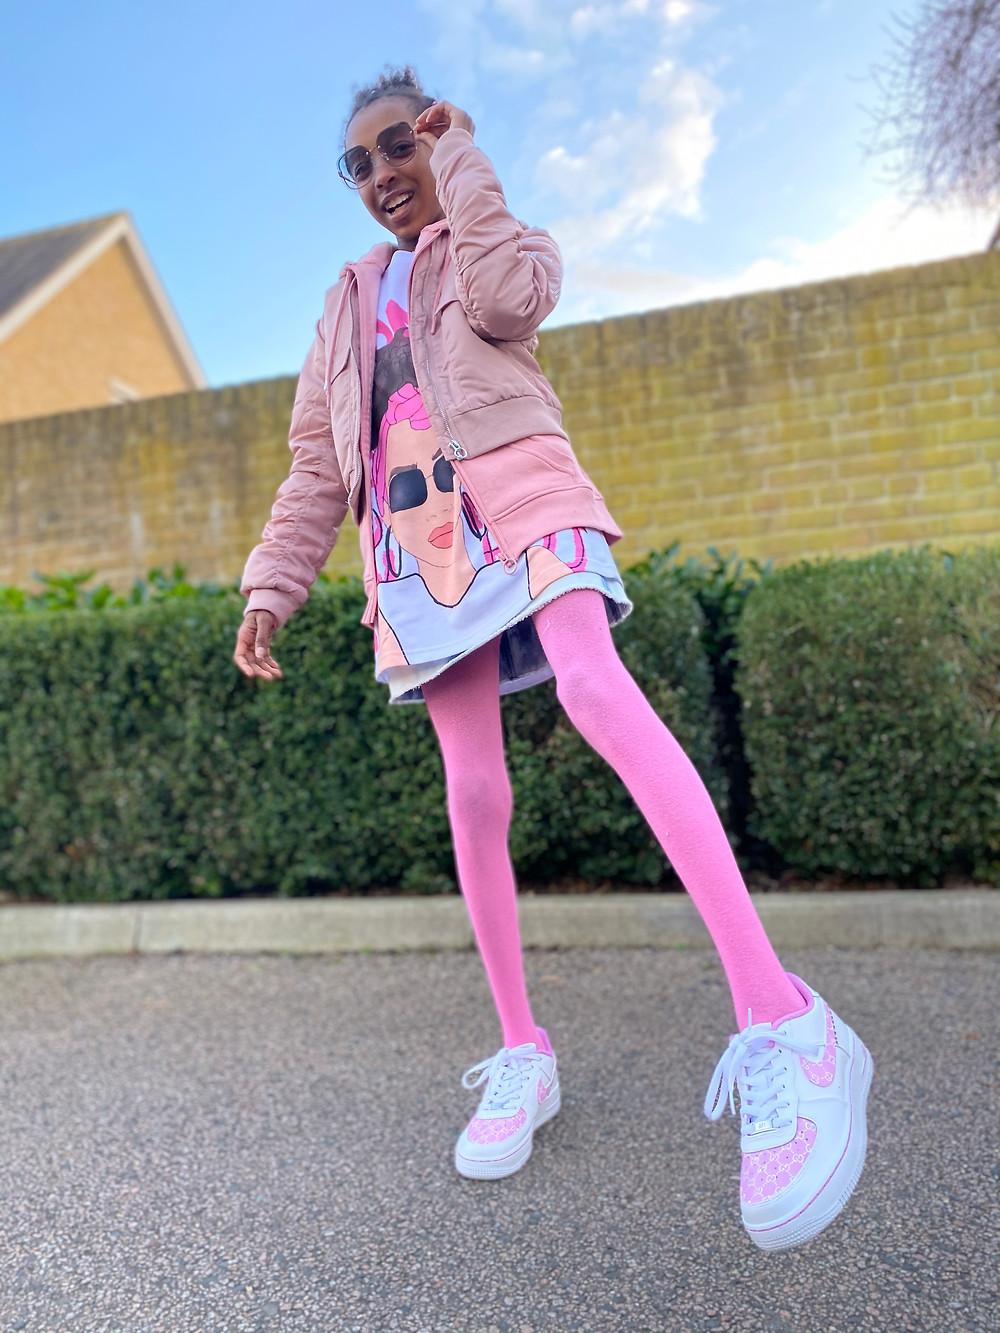 kids fashion blogger, smiling, how to style, kids fashion